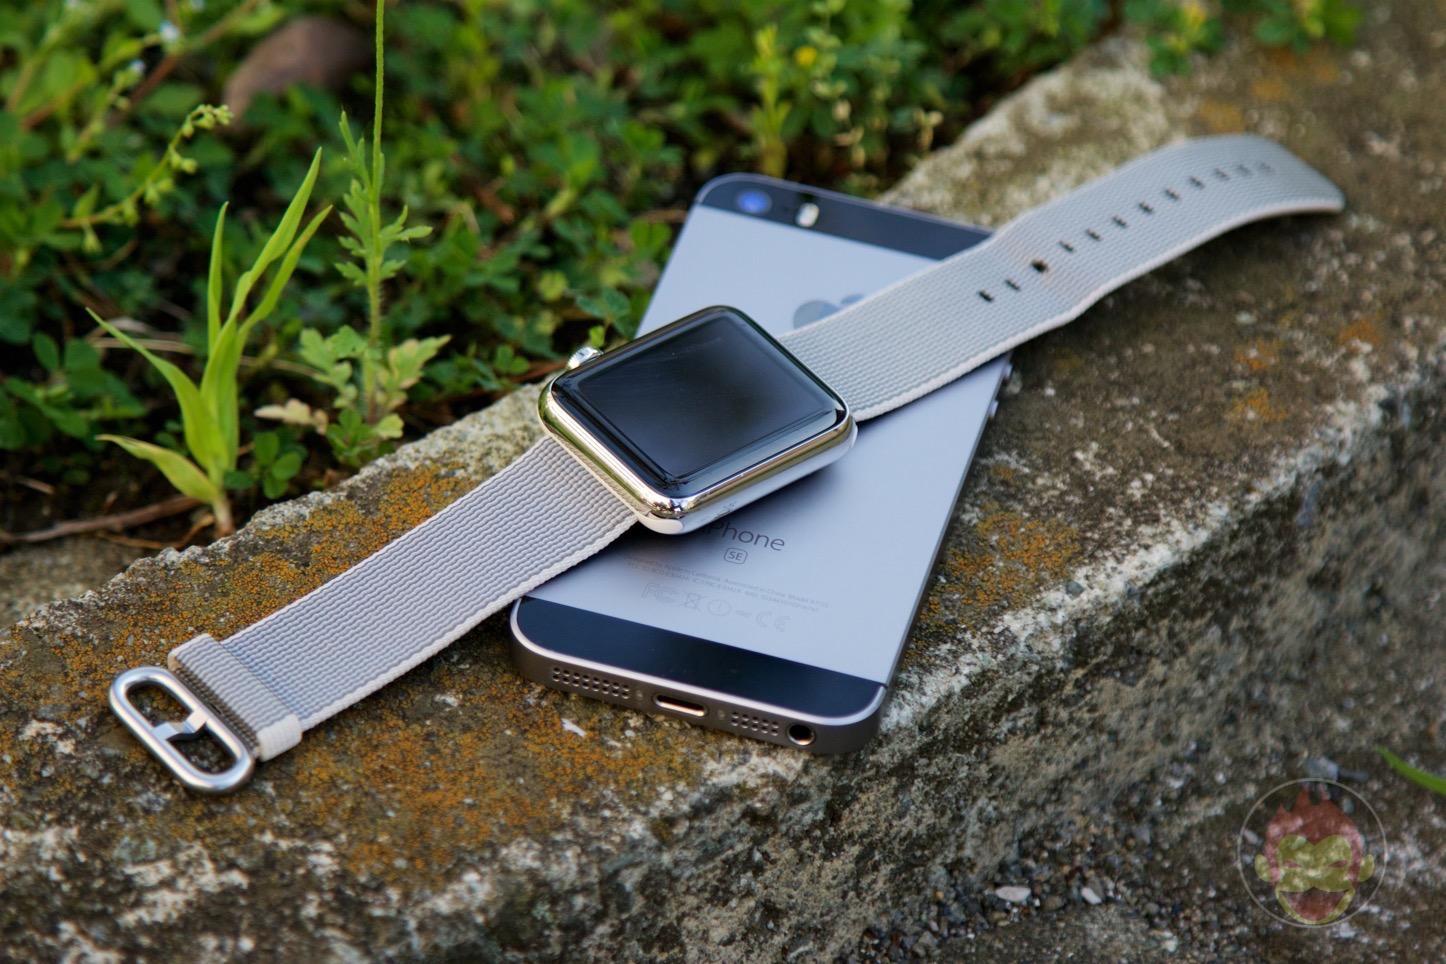 IPhone SE annd apple watch